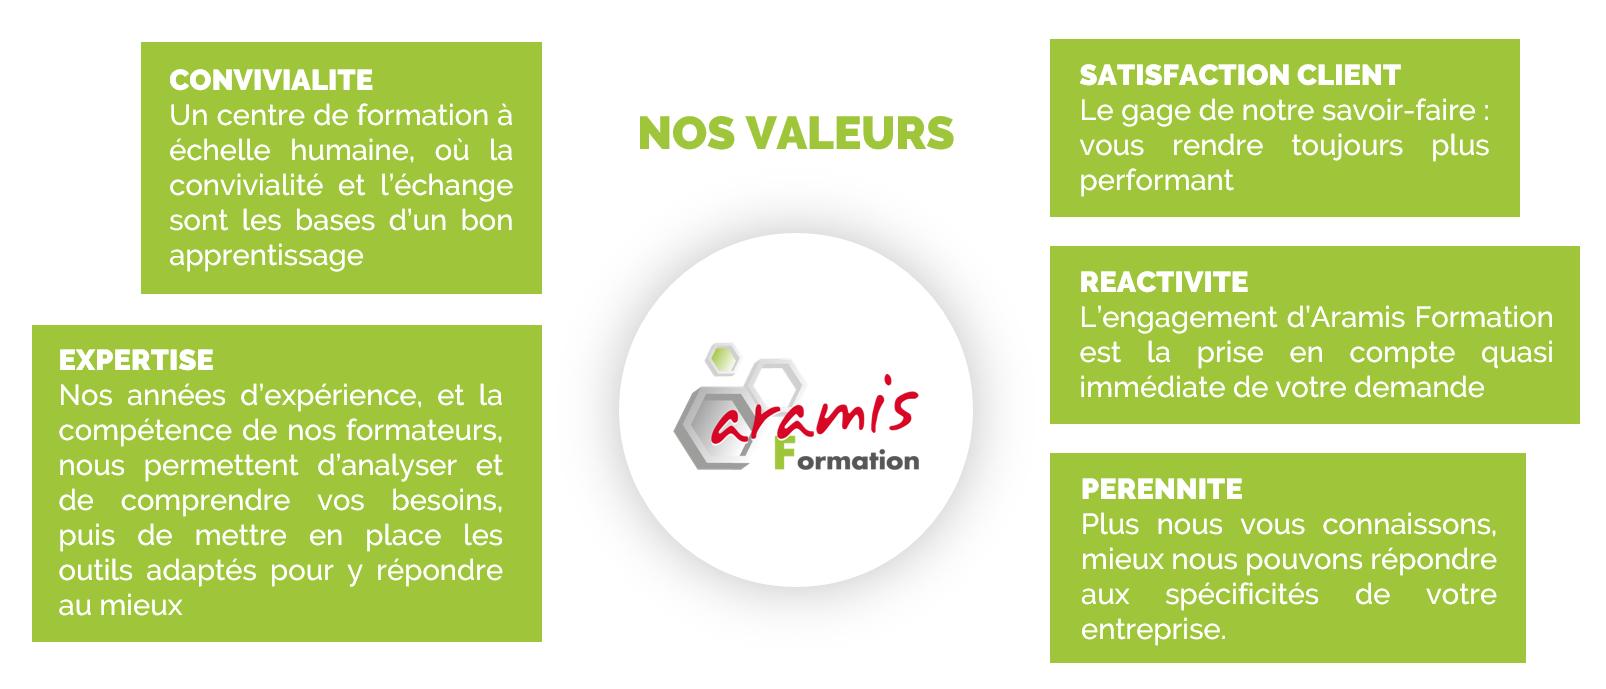 Les valeursd'Aramis Formation